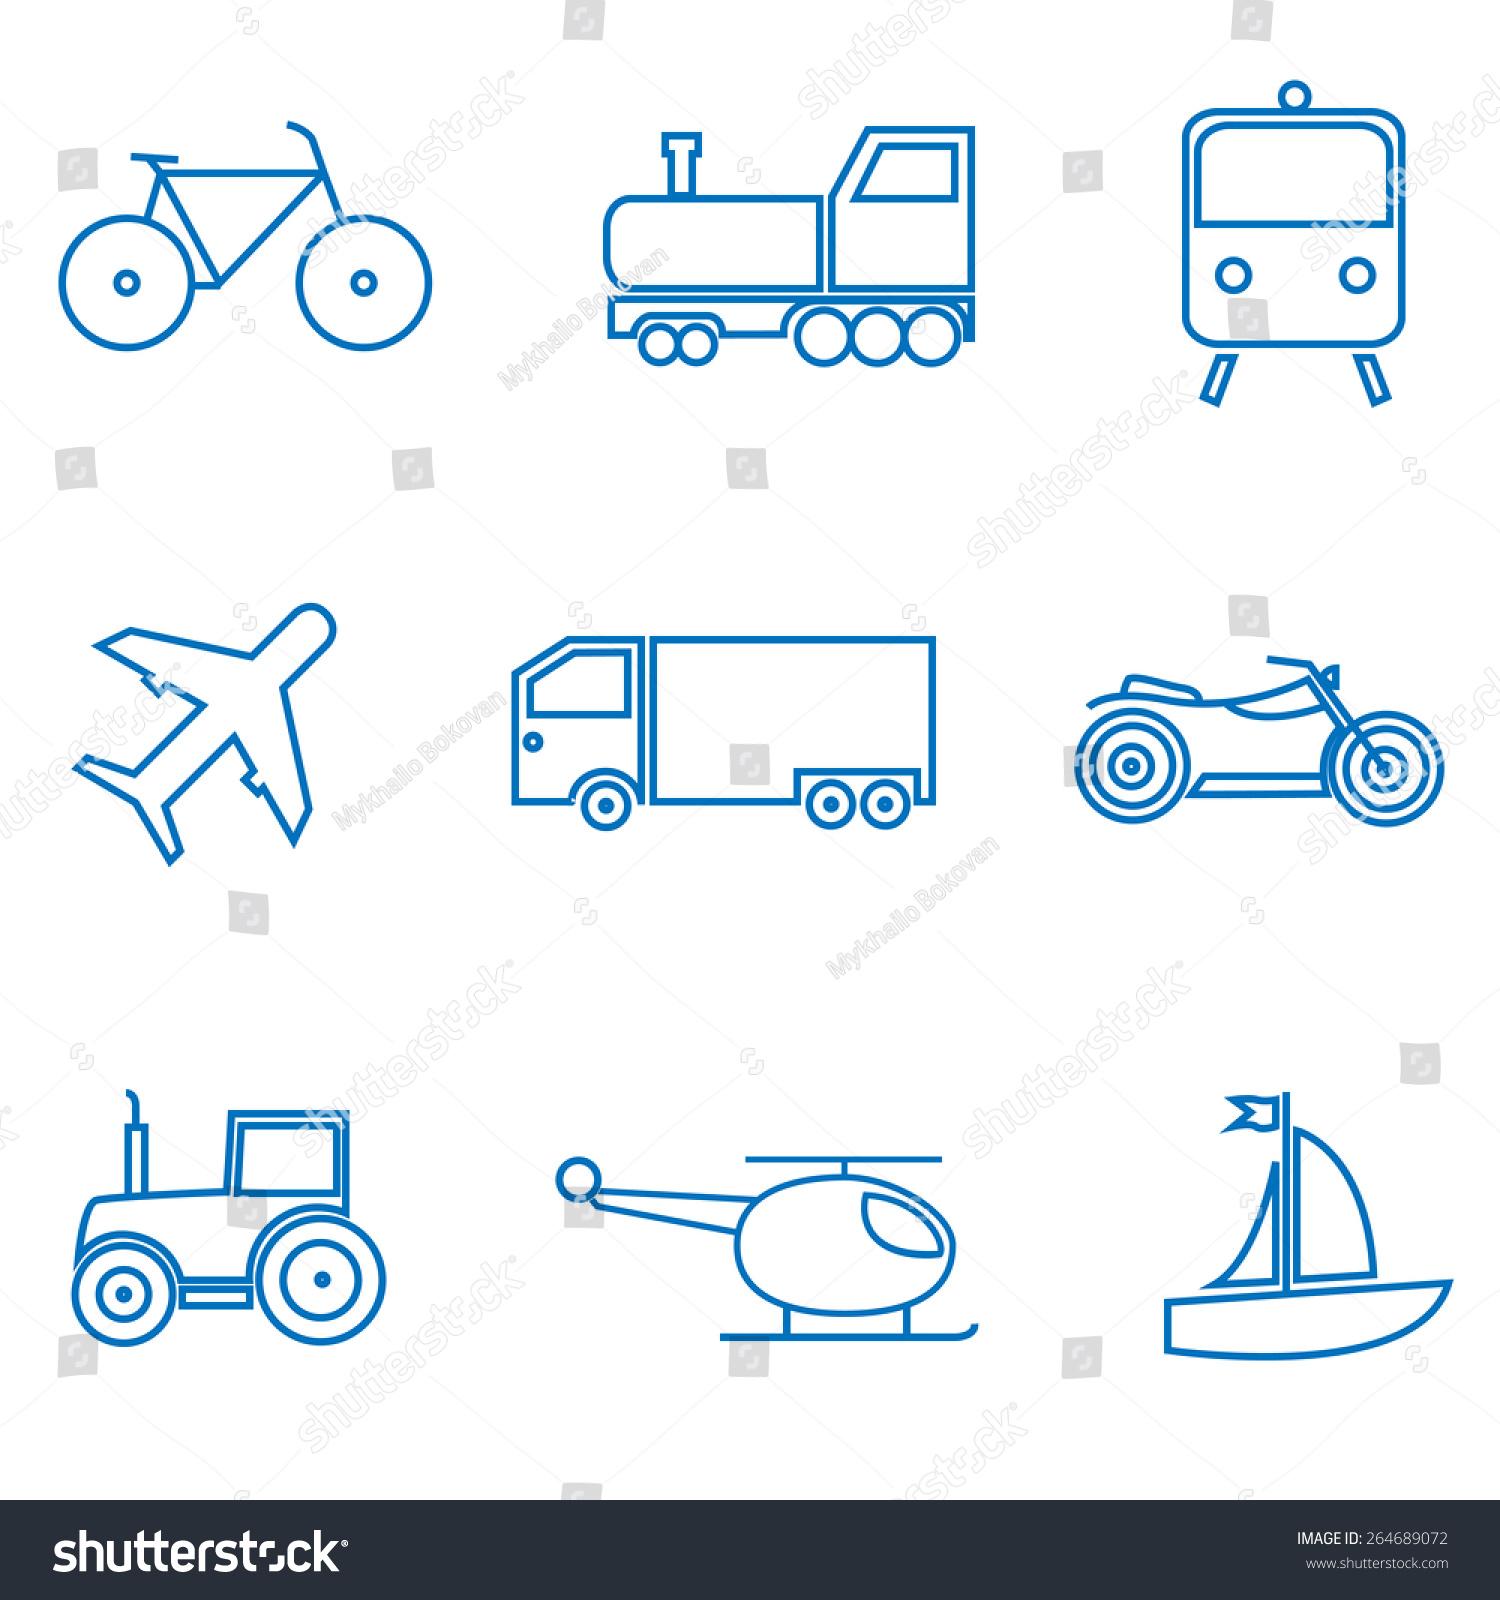 Mode of transport. Car, train, plane, bike, truck, tractor icon